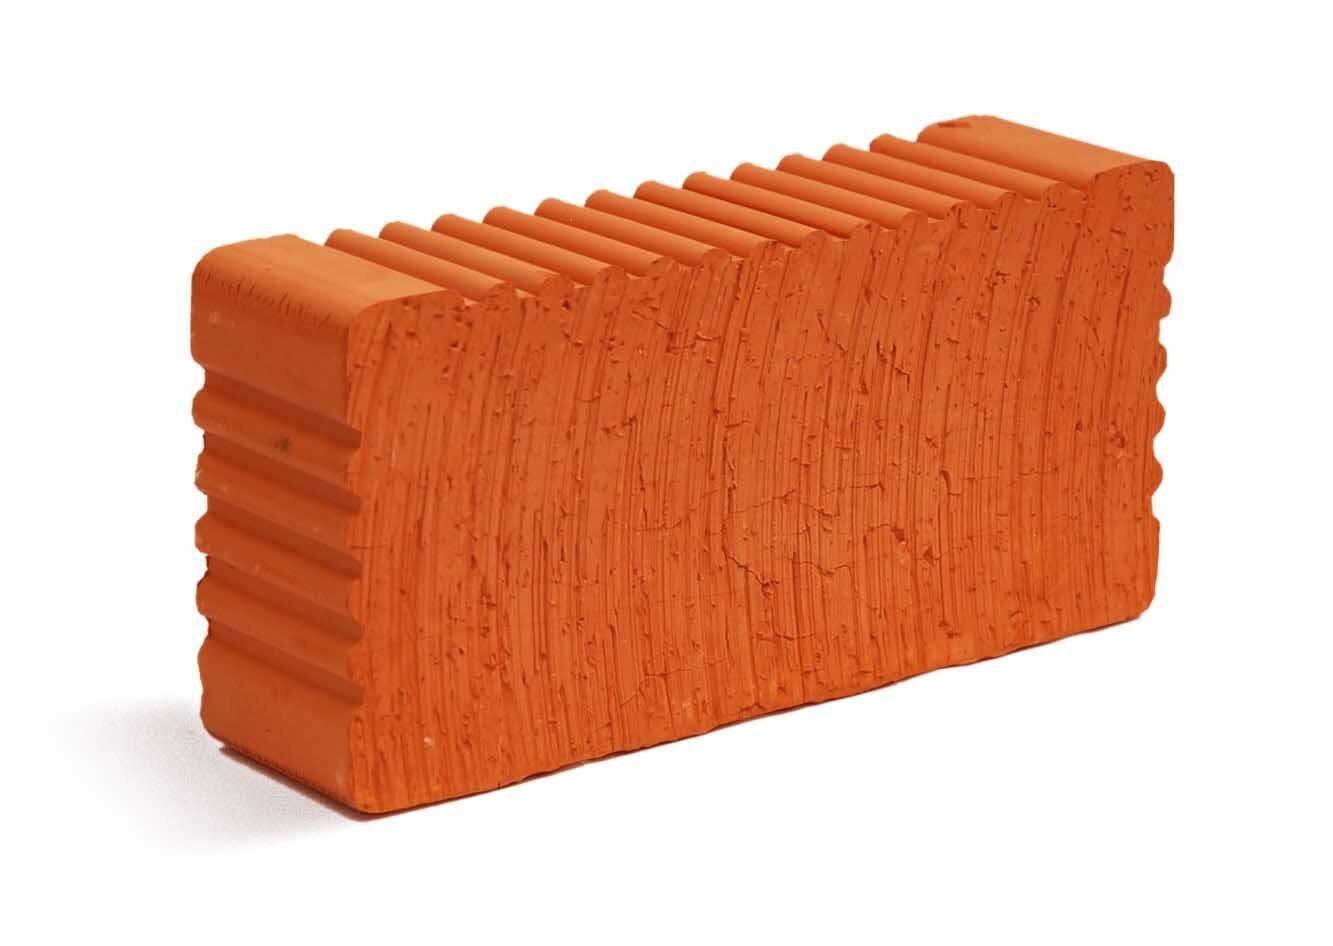 керамический кирпич фото